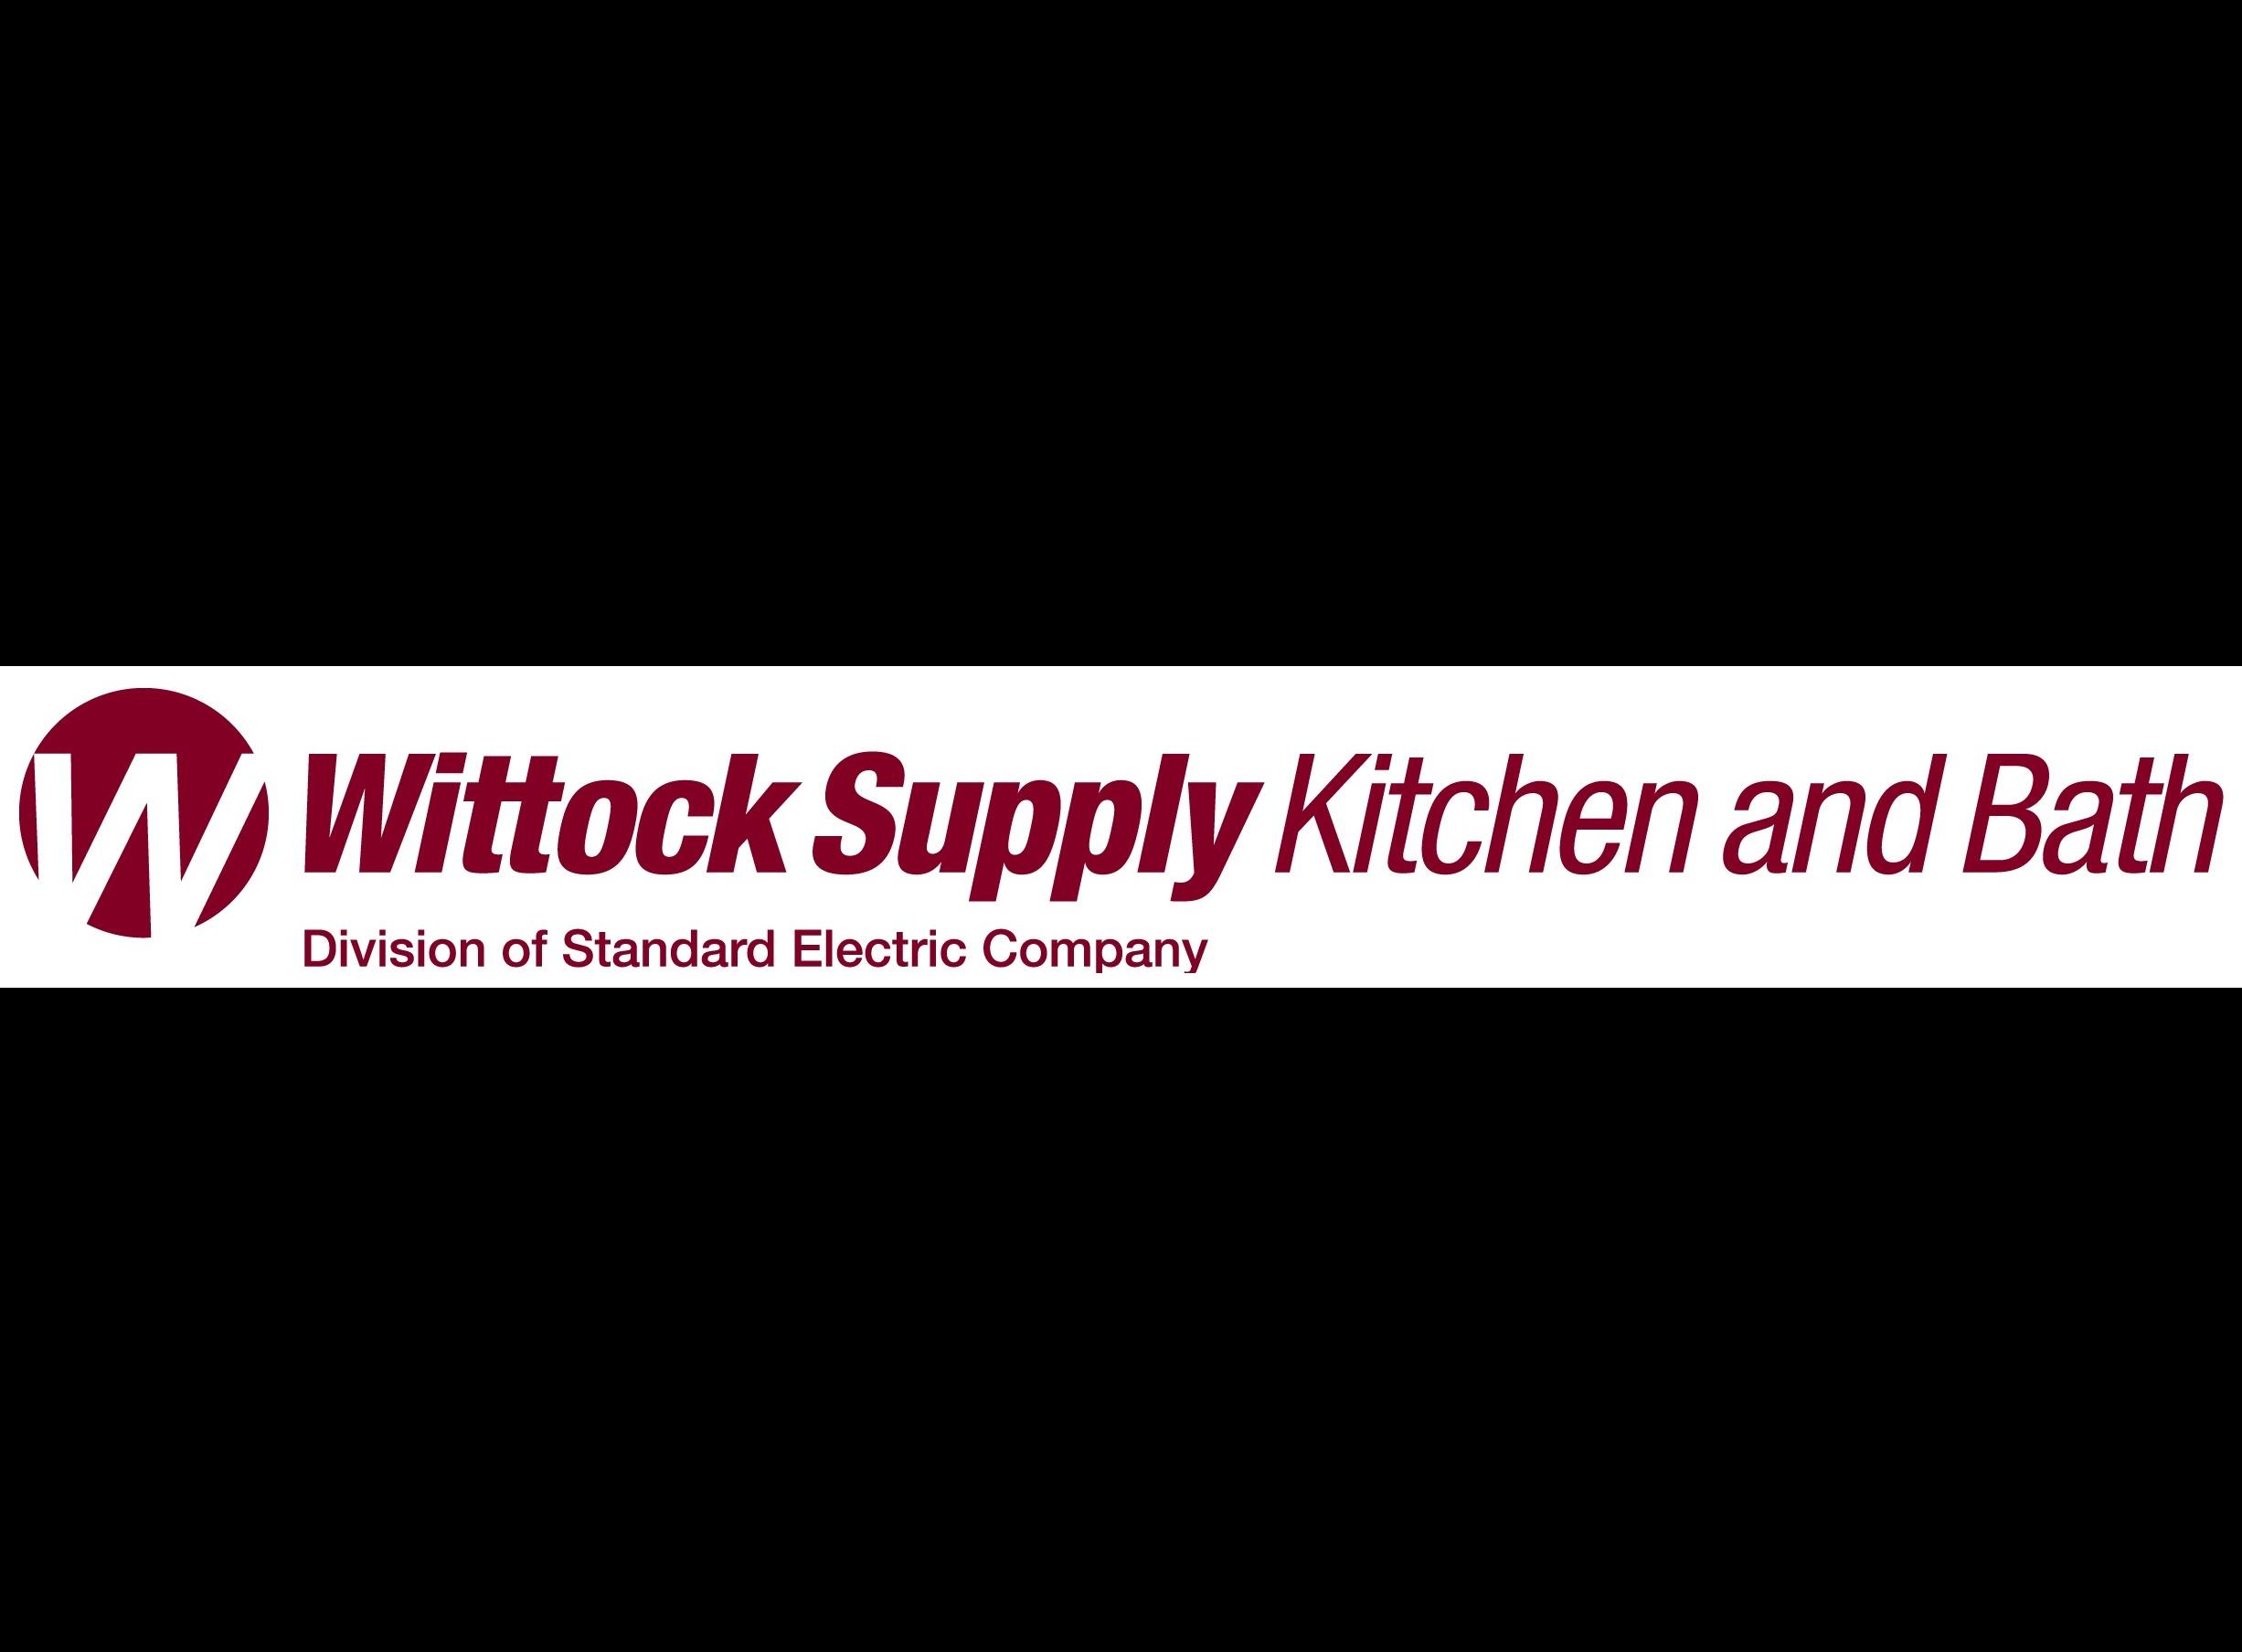 Wittock Supply Kitchen And Bath